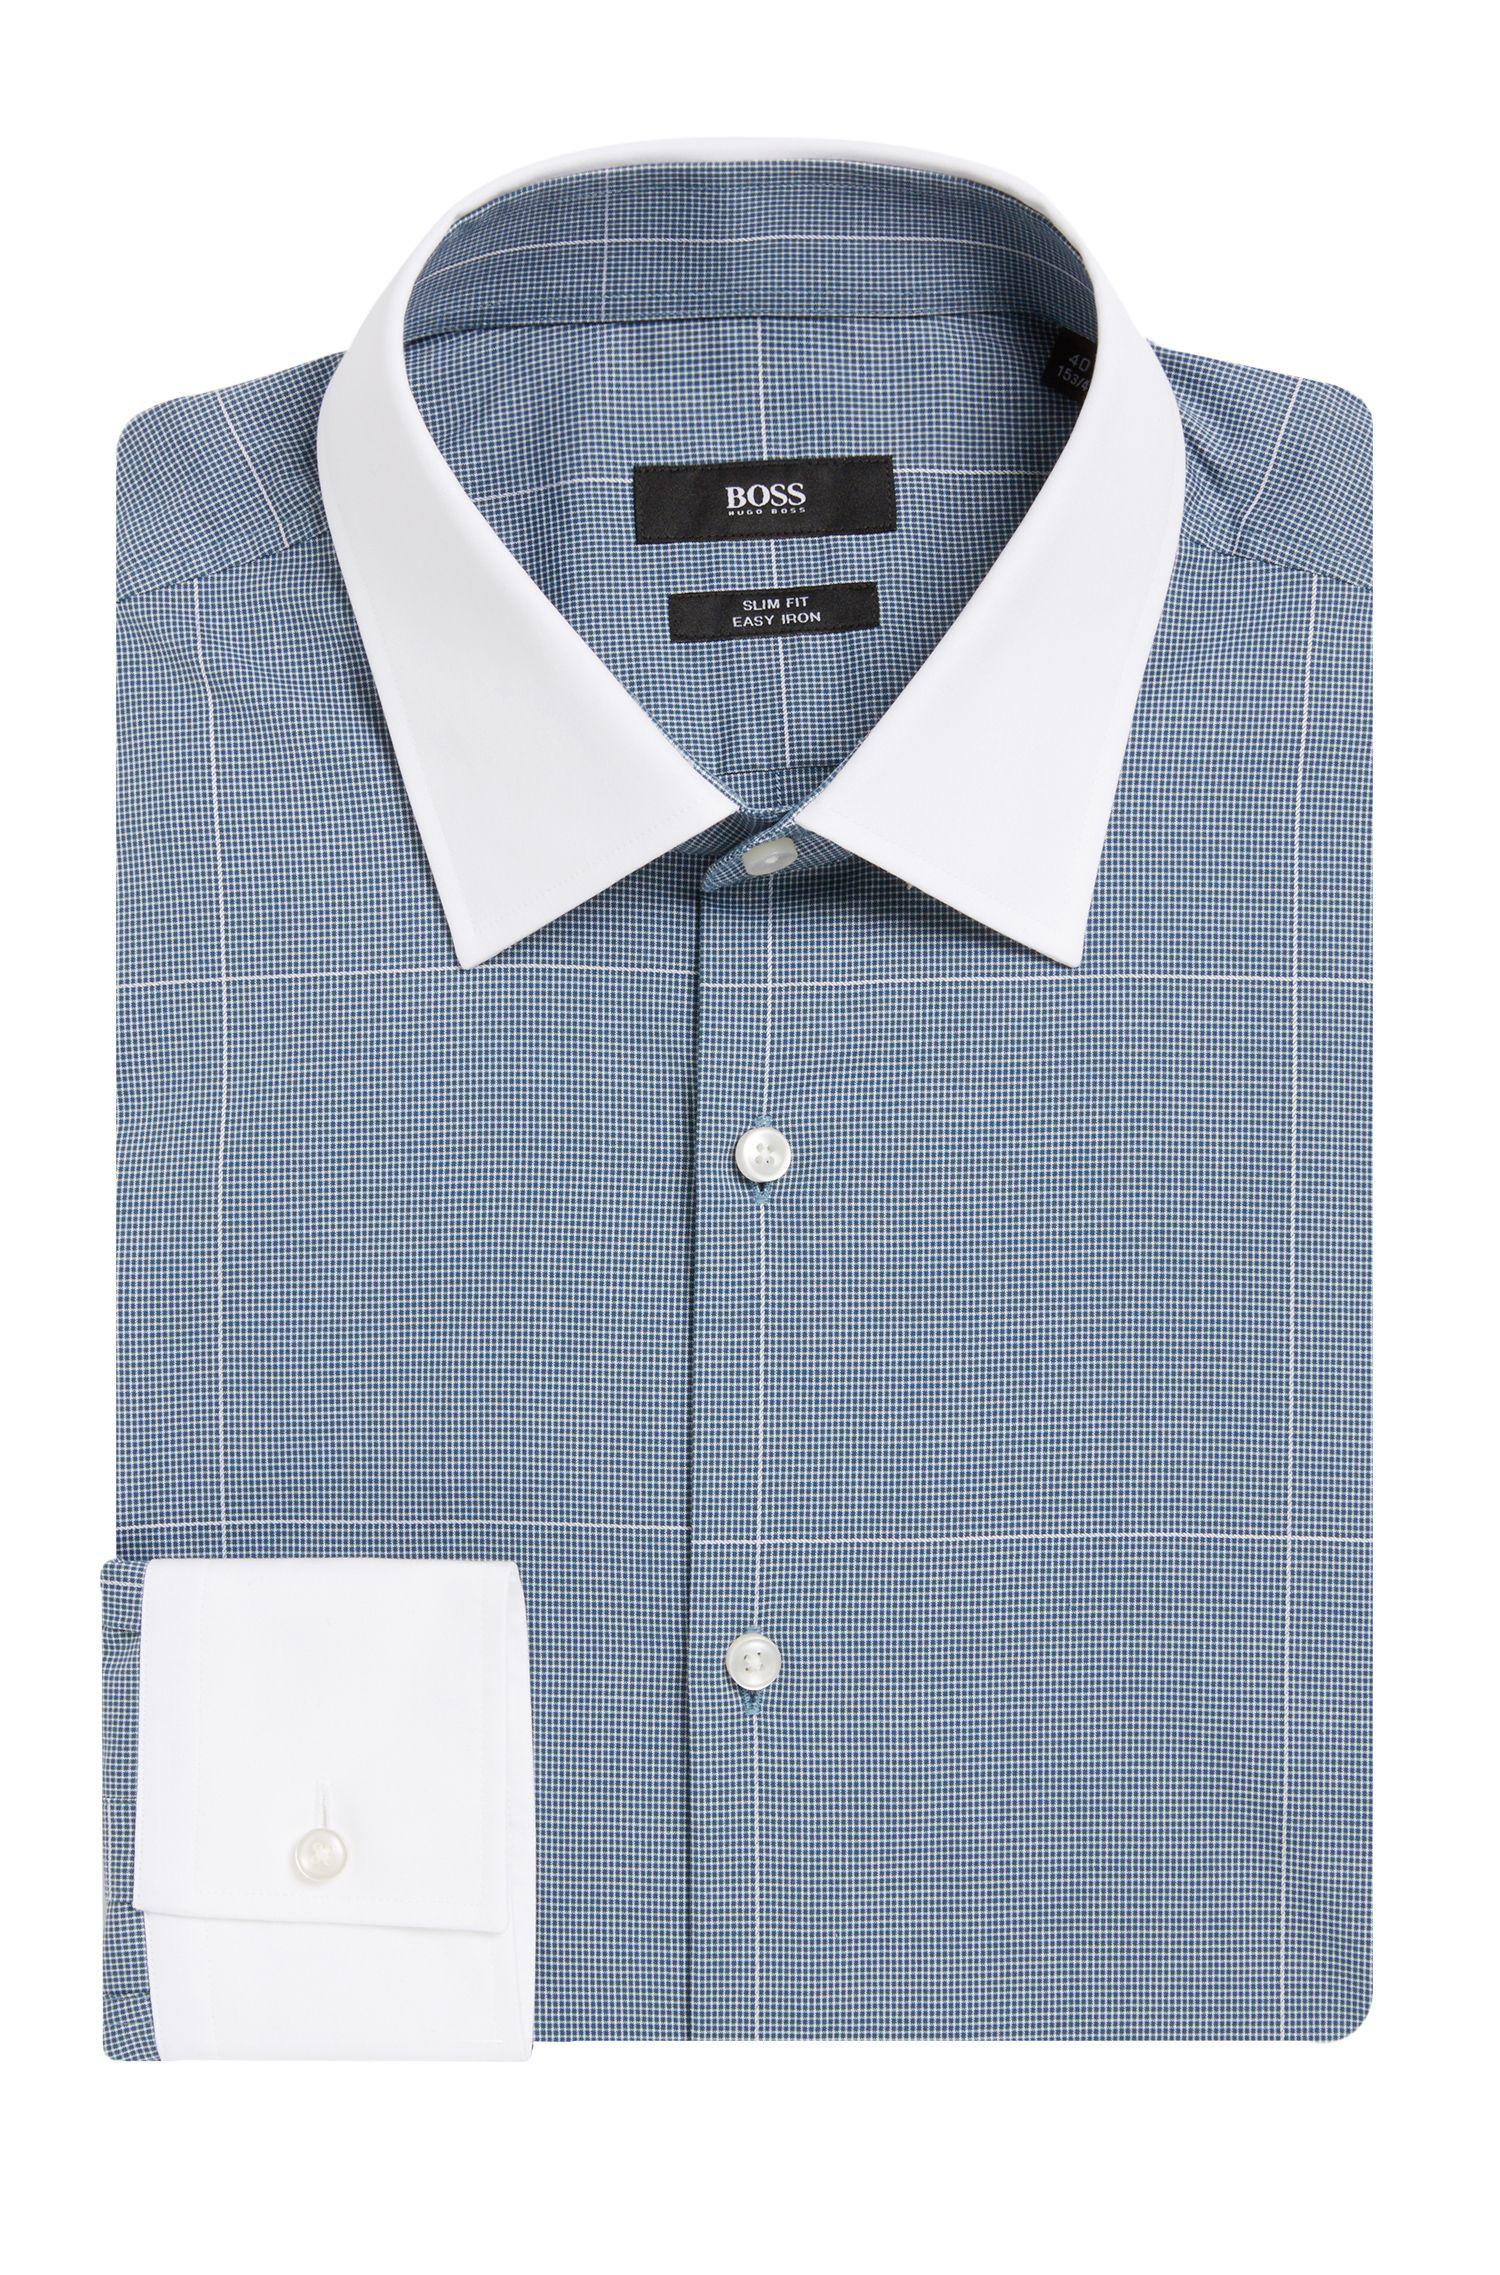 'Jonnes' | Slim Fit, Easy Iron Cotton Dress Shirt